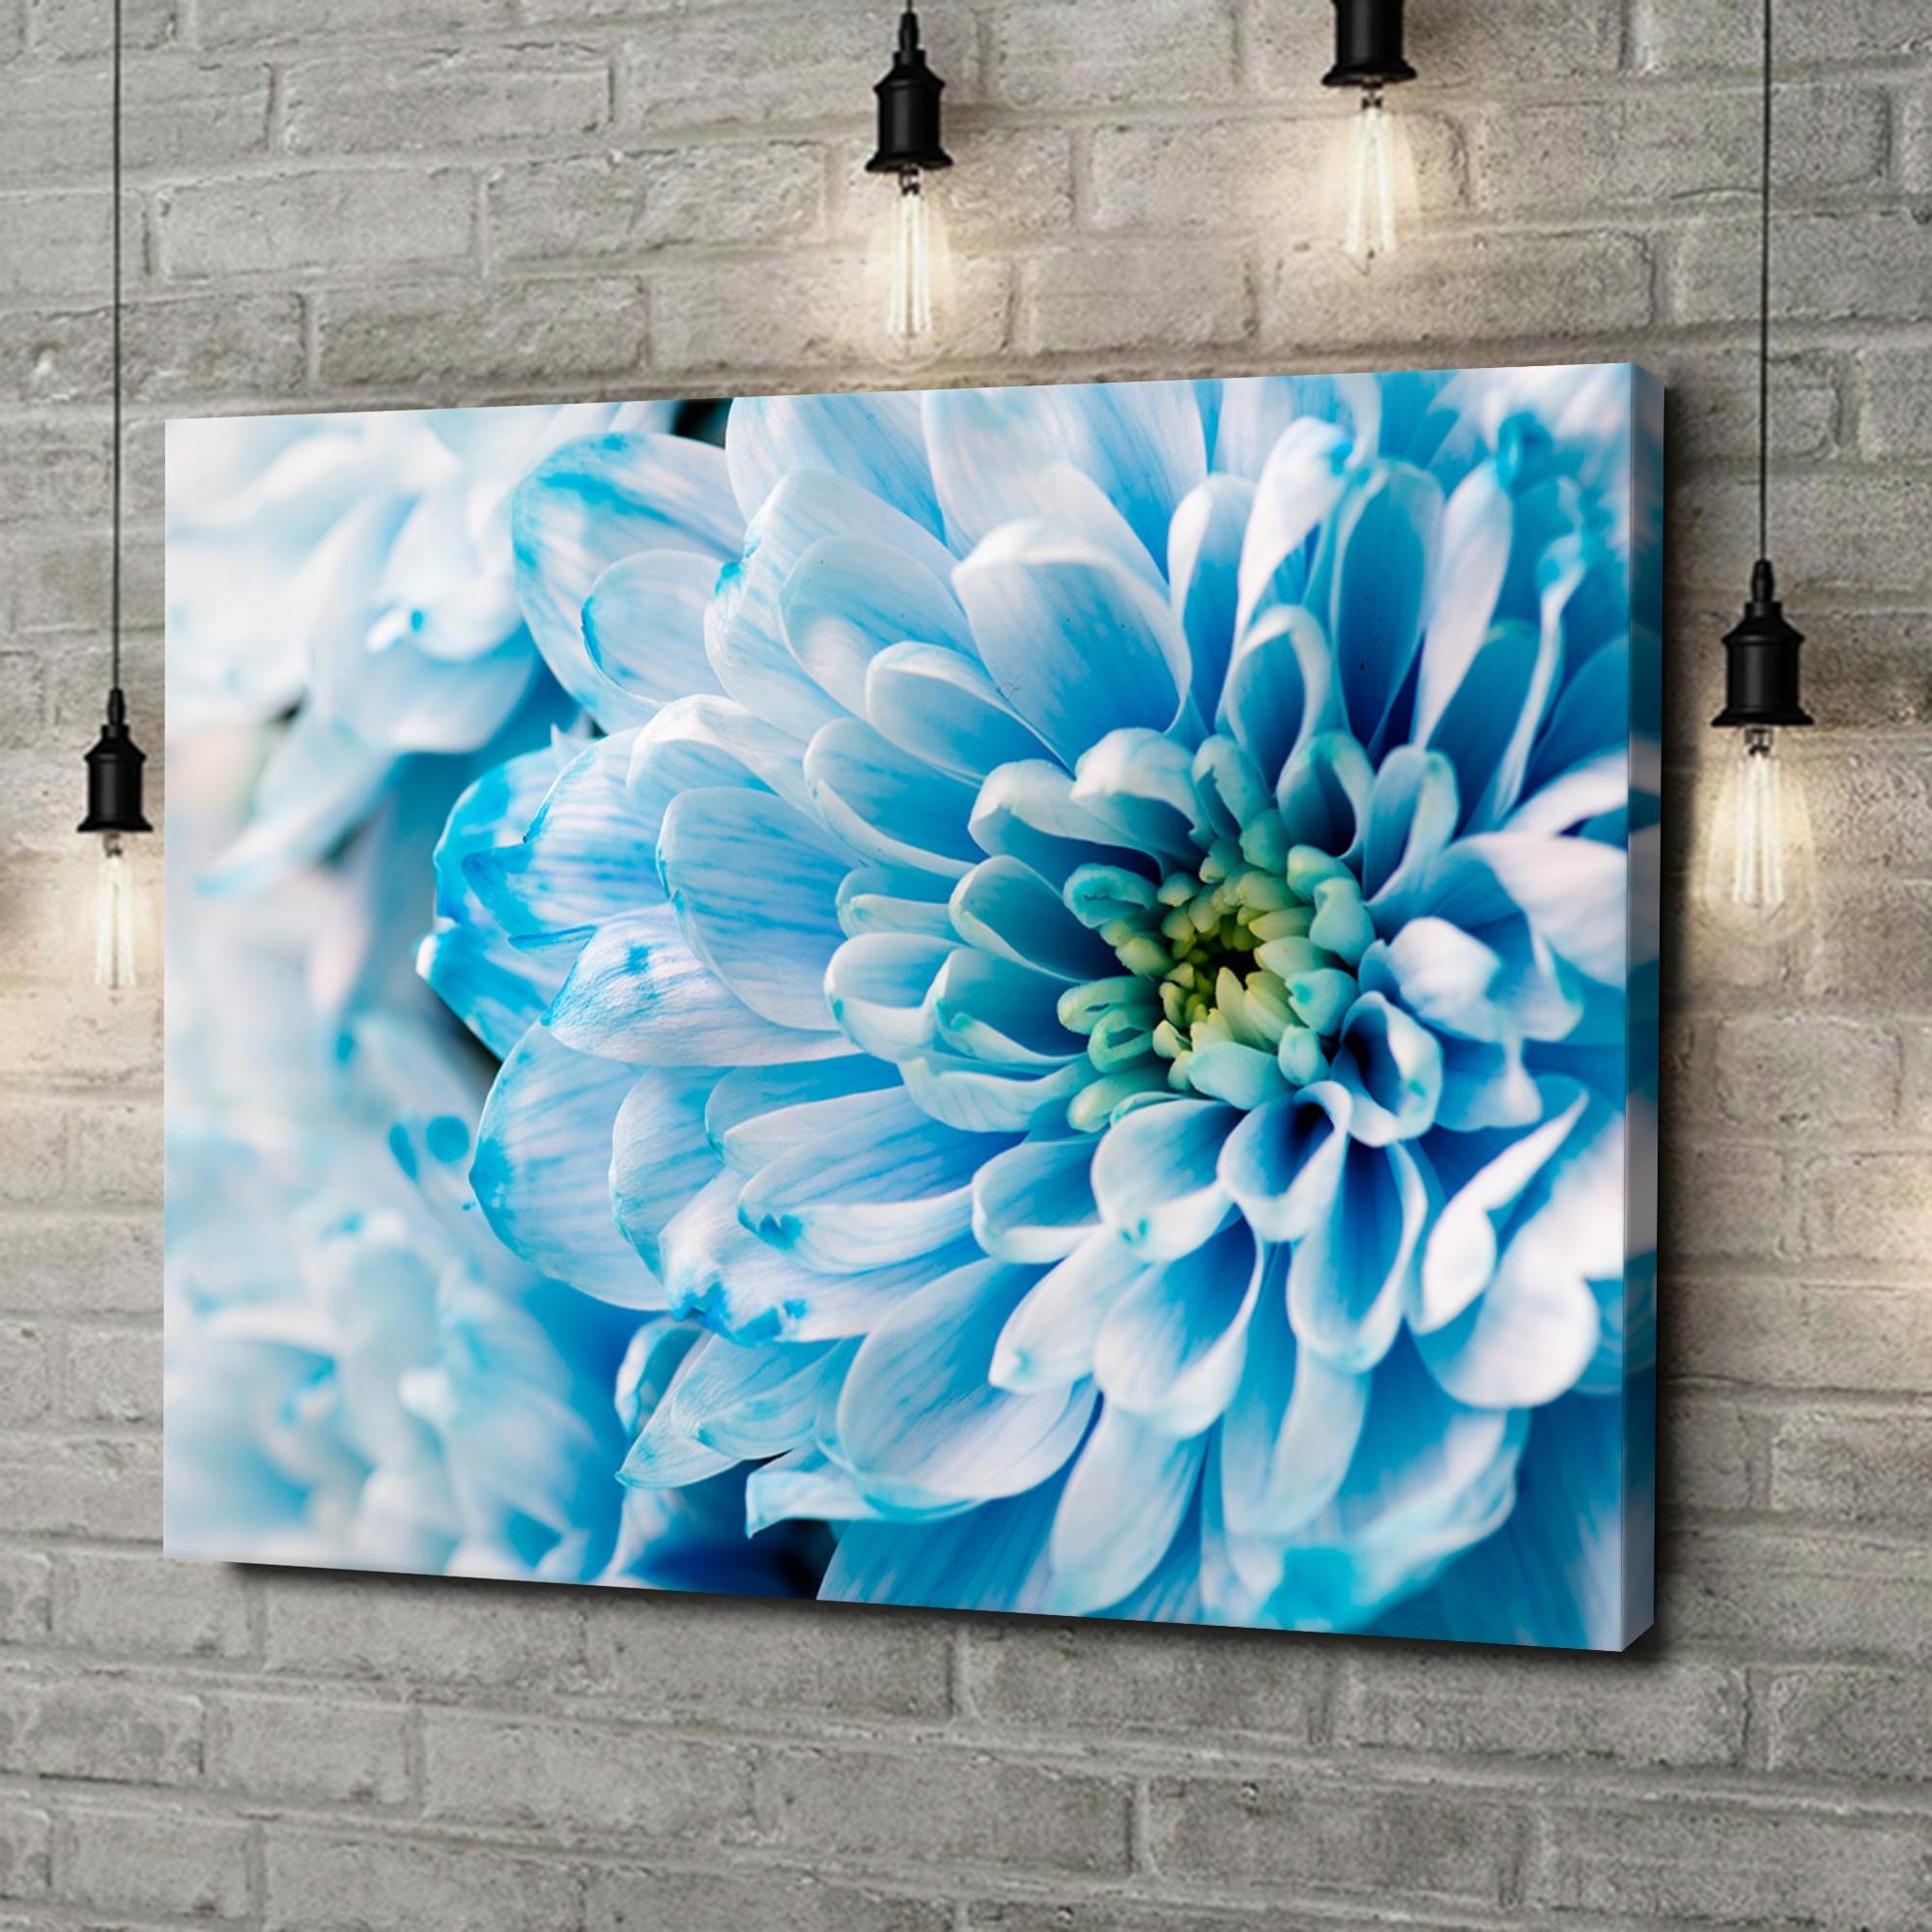 Leinwandbild personalisiert Blaue Chrysantheme